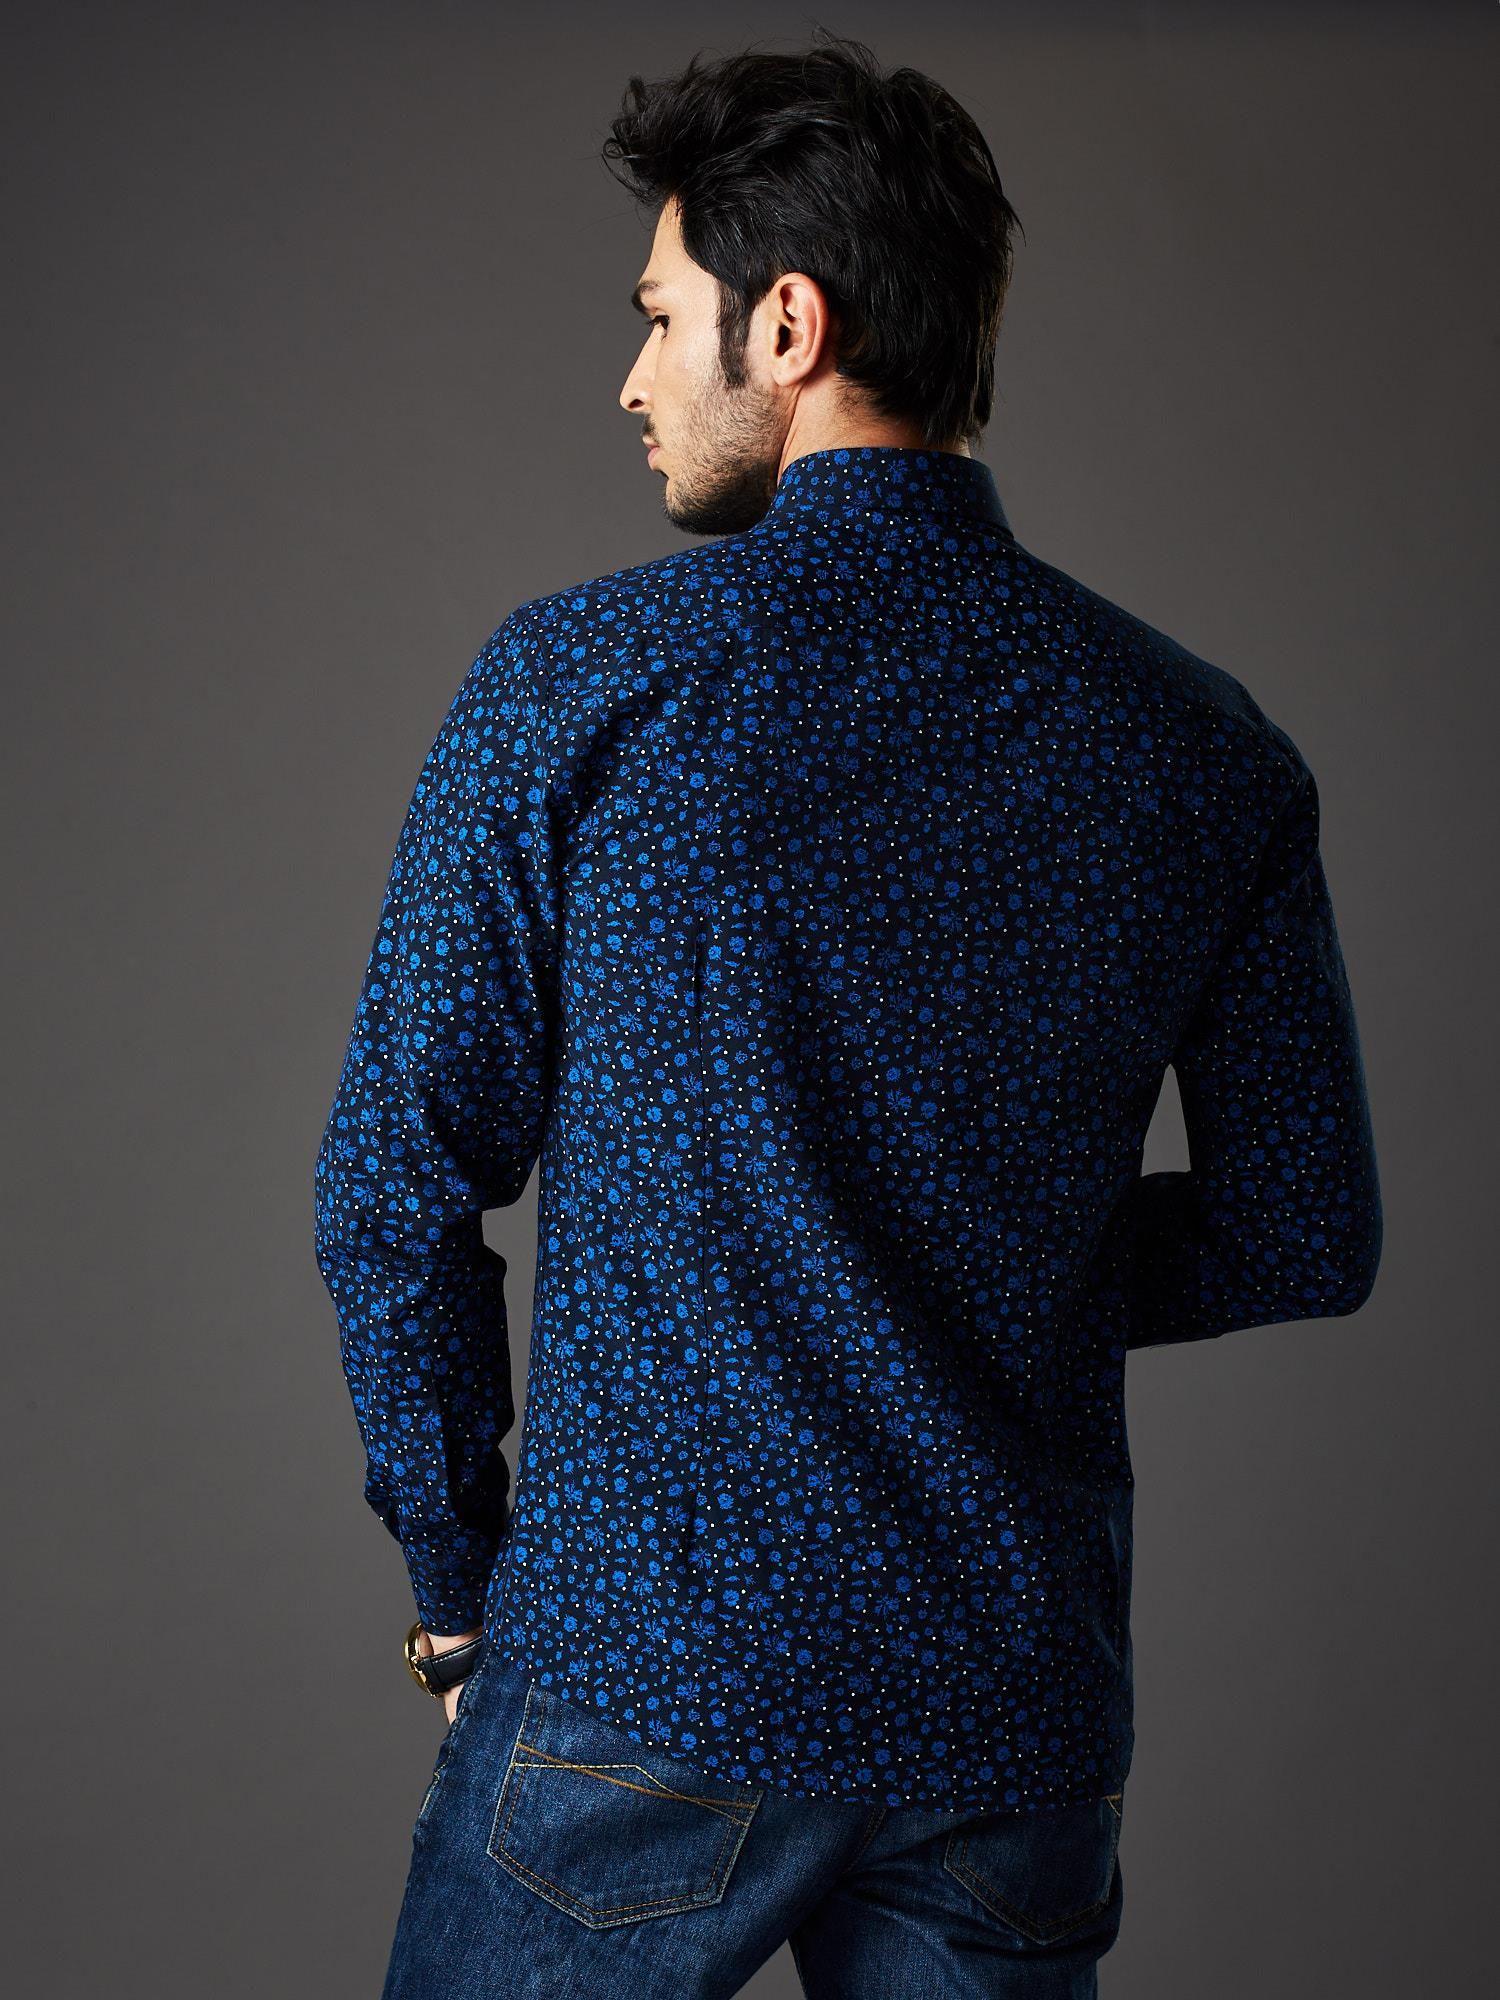 0d3dfae8d58ee Granatowa koszula męska regular fit w roślinny wzór - Mężczyźni koszula  męska - sklep eButik.pl